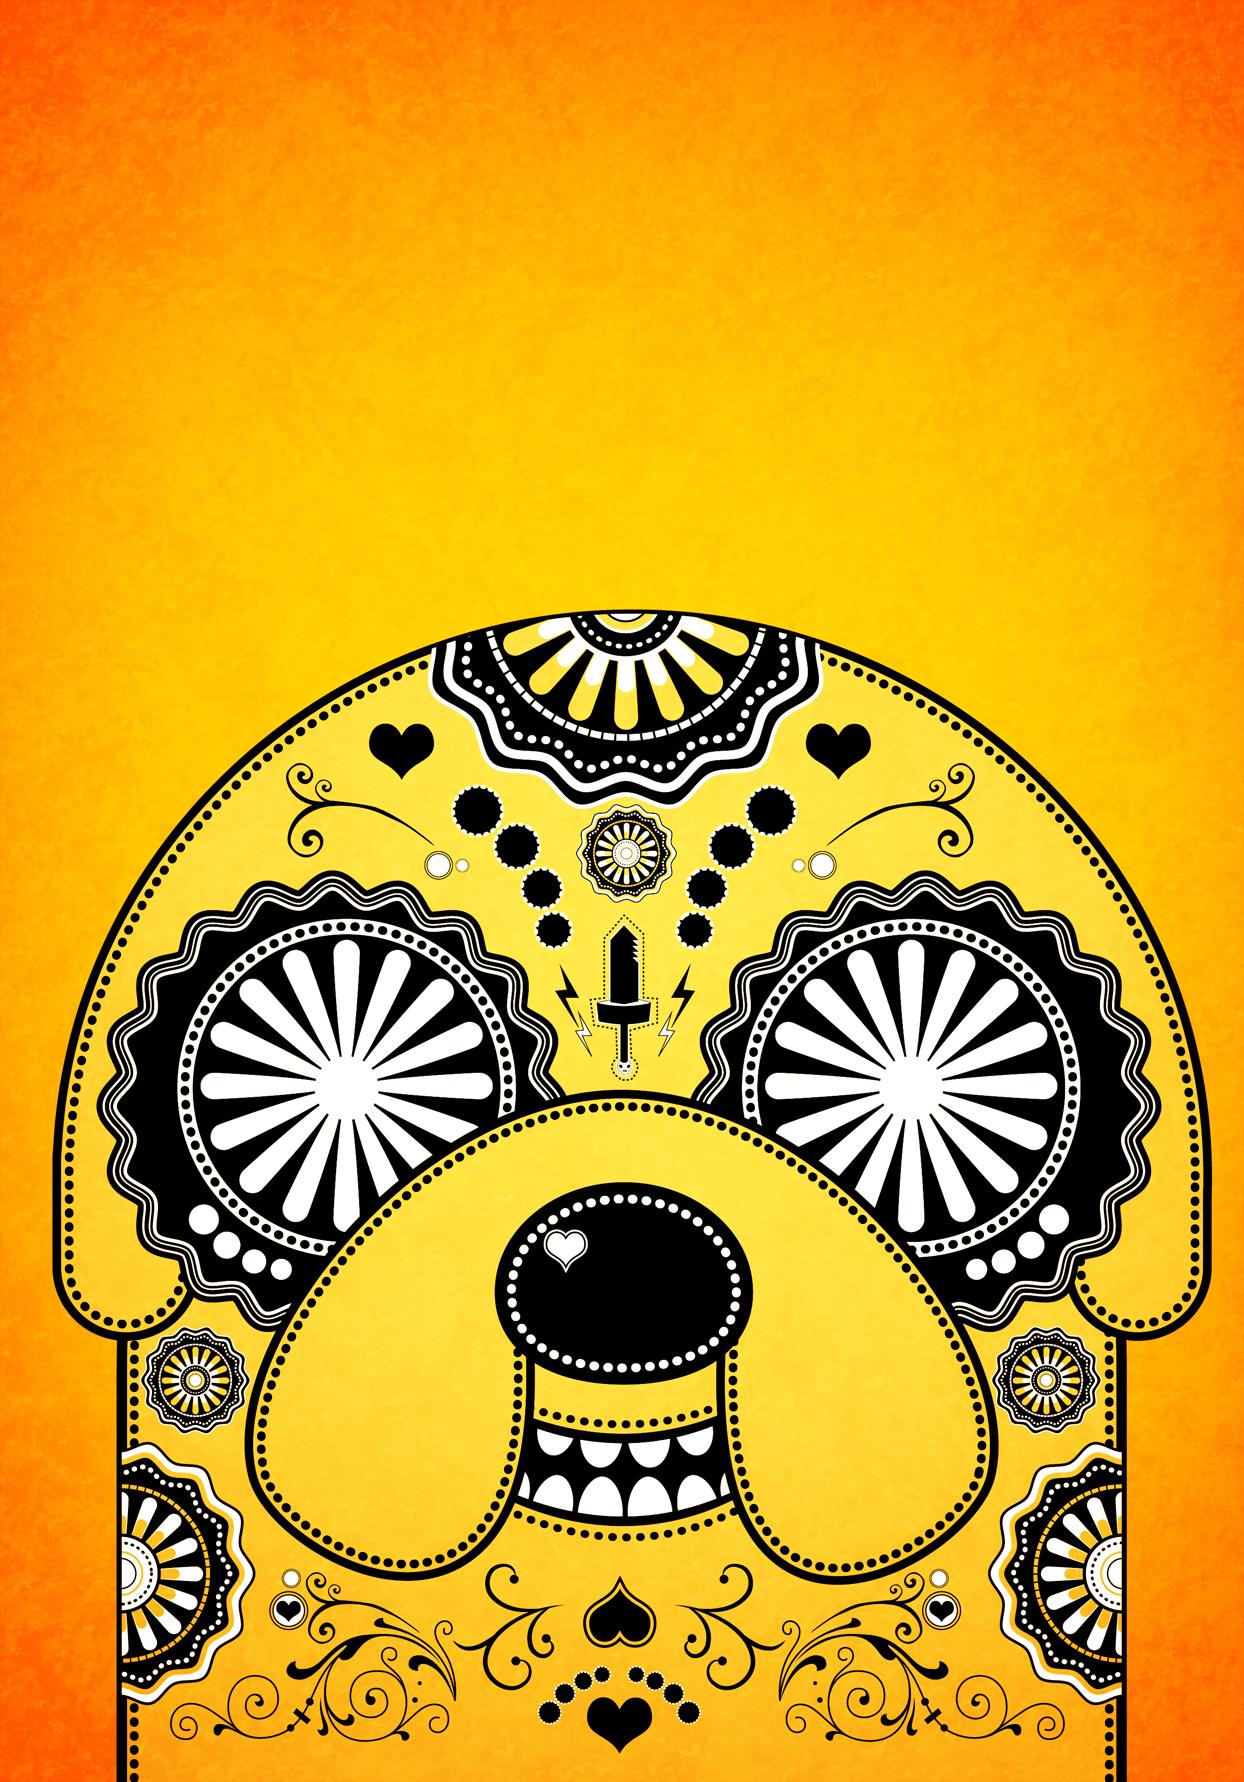 Jake Adventure Time Sugar Skull Poster Orange By